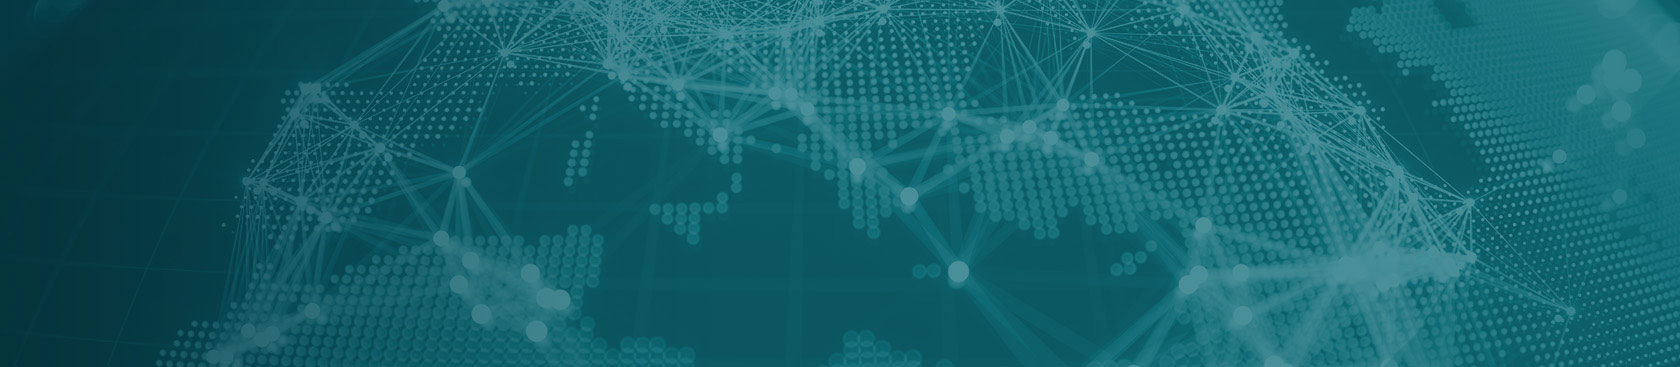 network-traffic-analysis